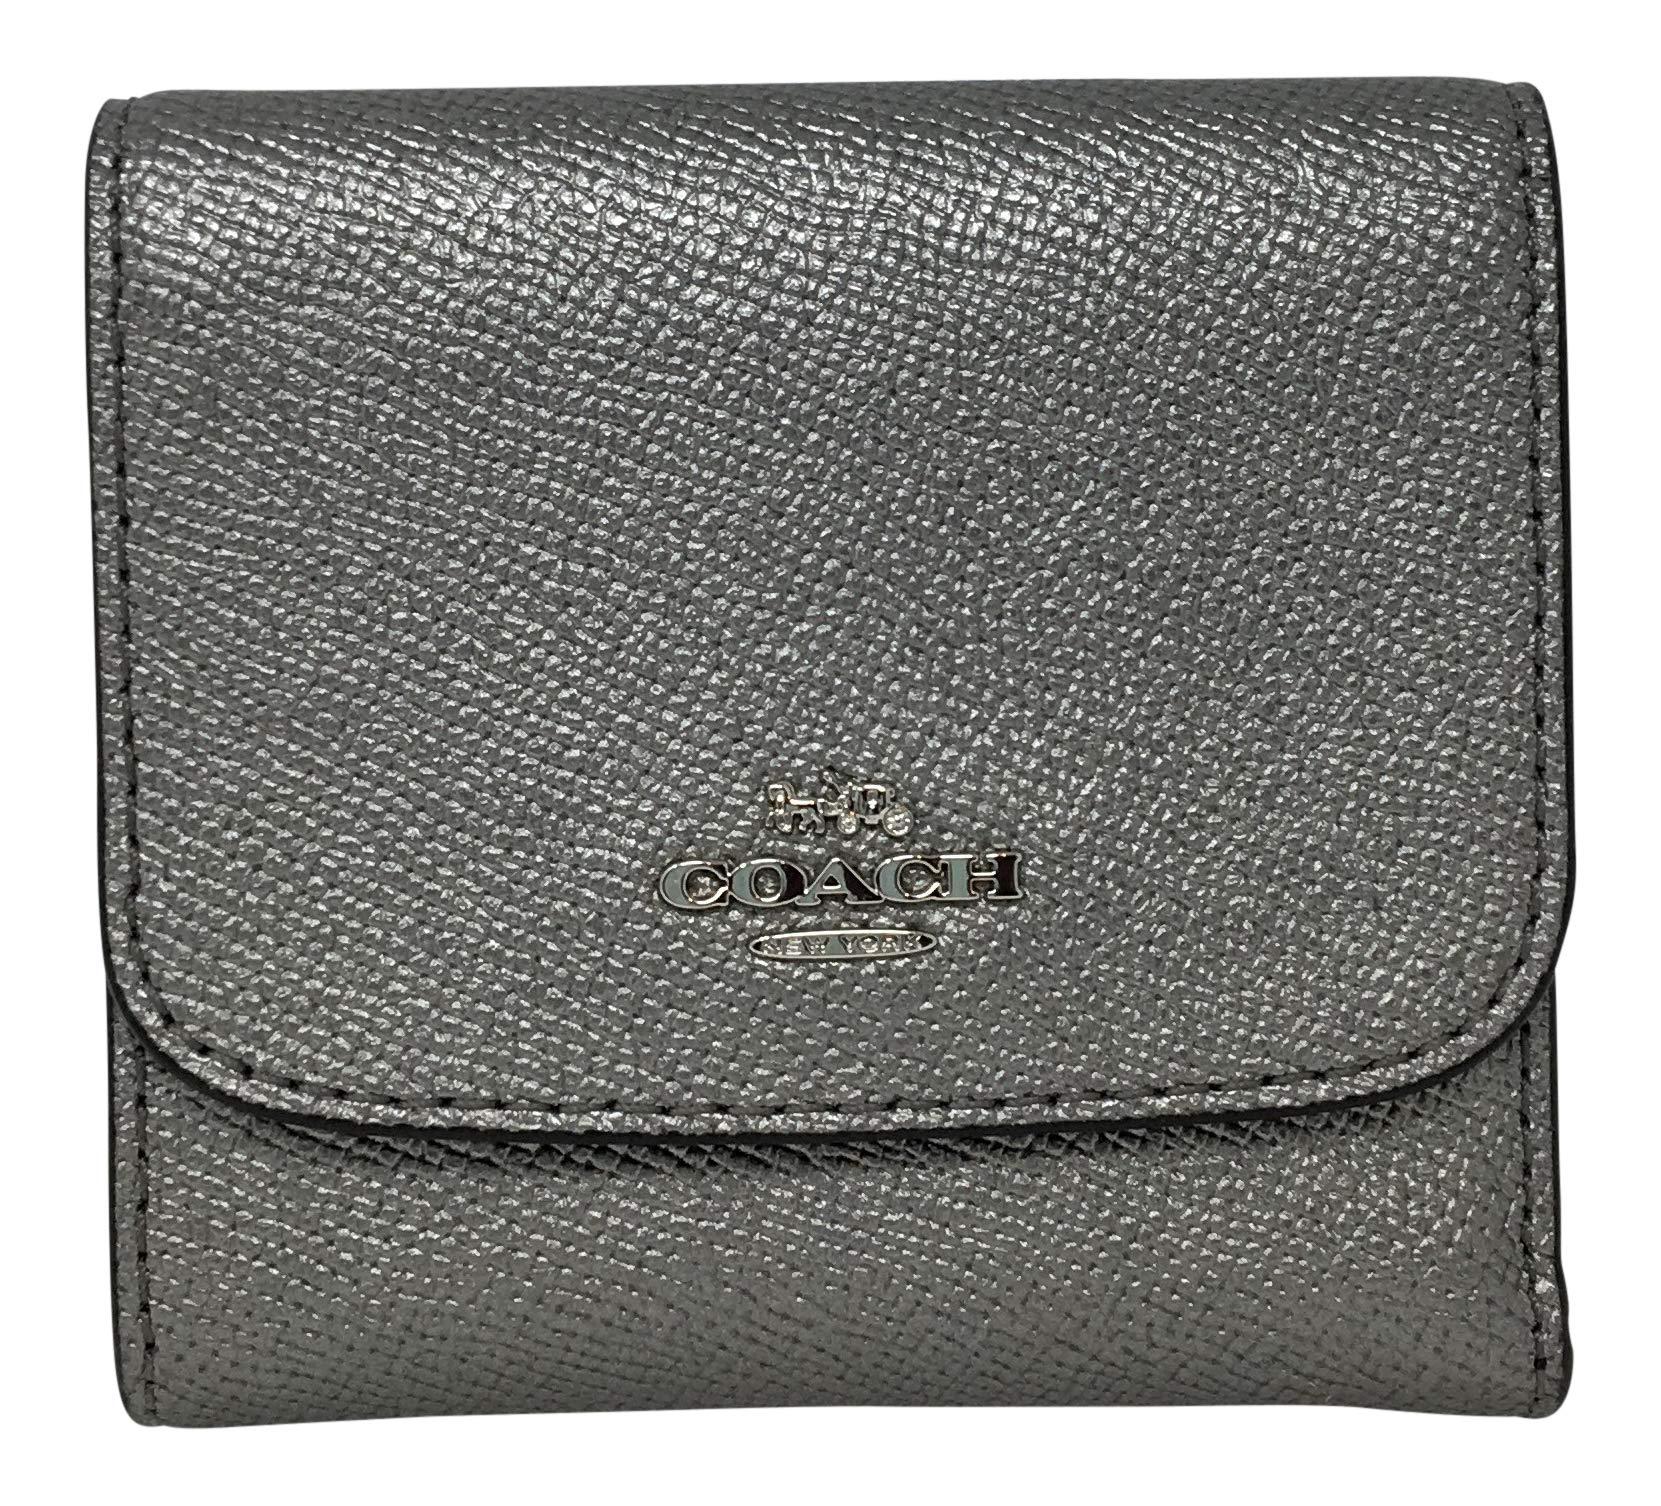 COACH Metallic Crossgrain Leather Small Wallet Gunmetal F21069